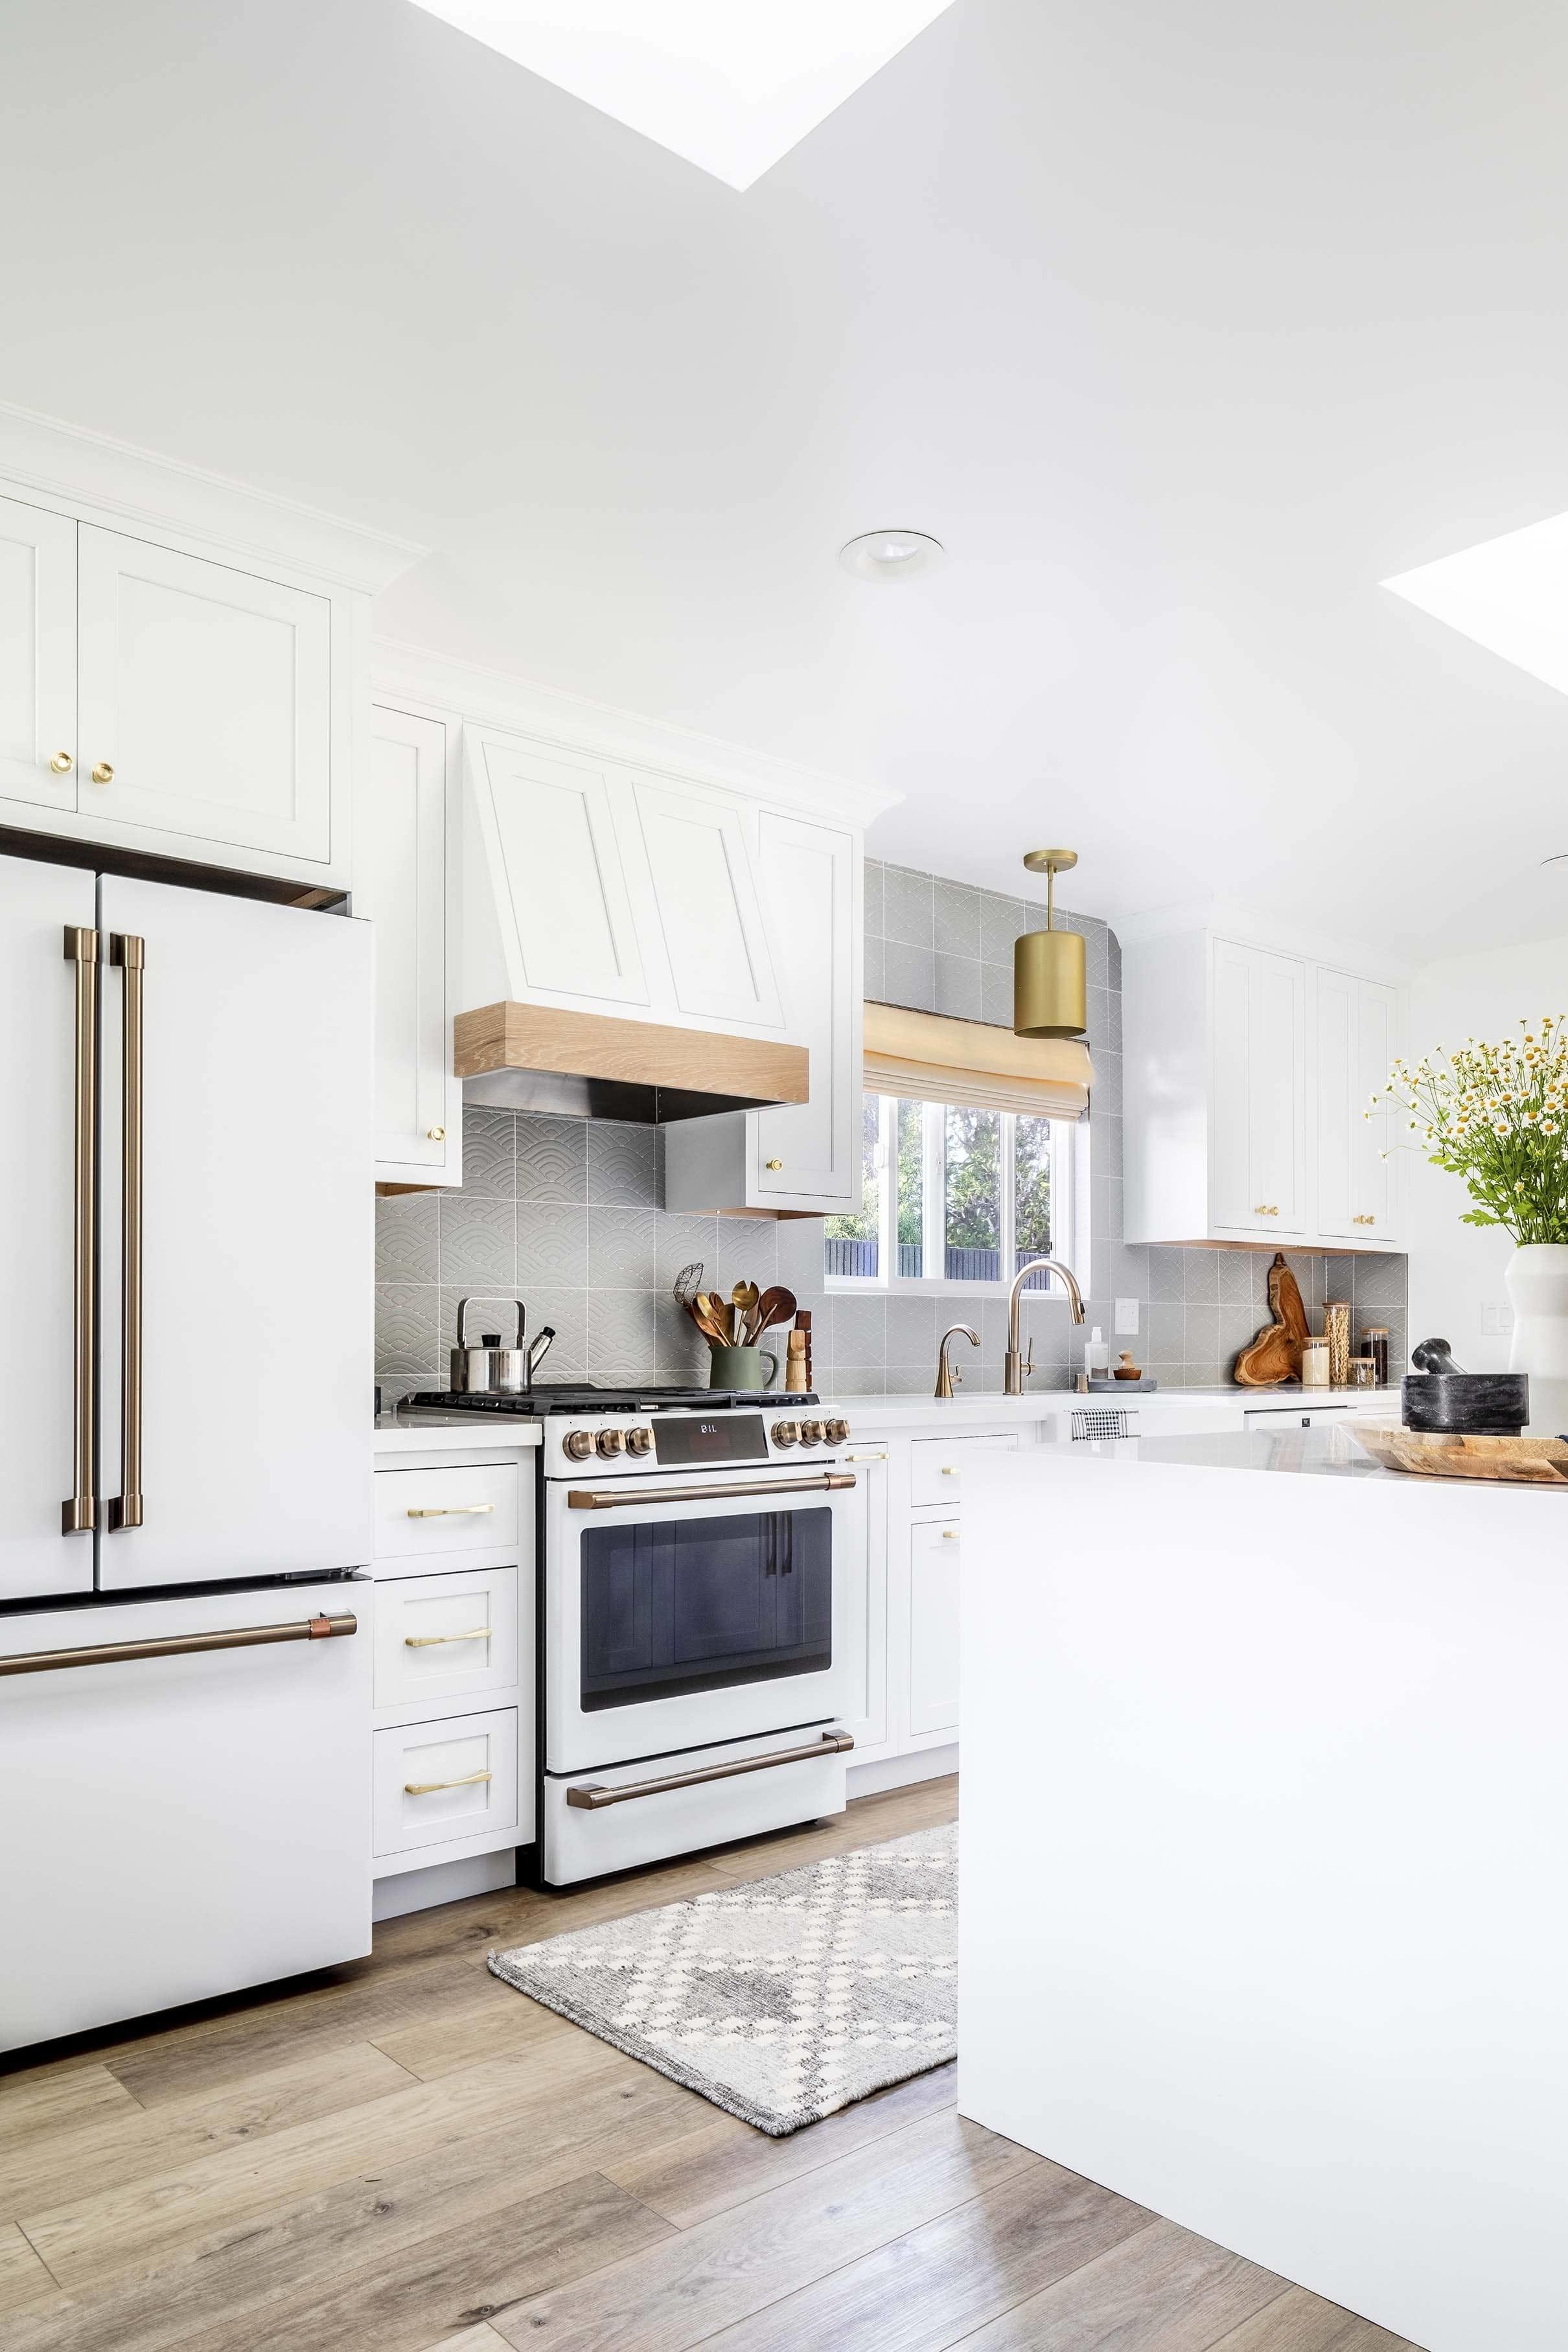 White kitchen refrigerator stove skylights